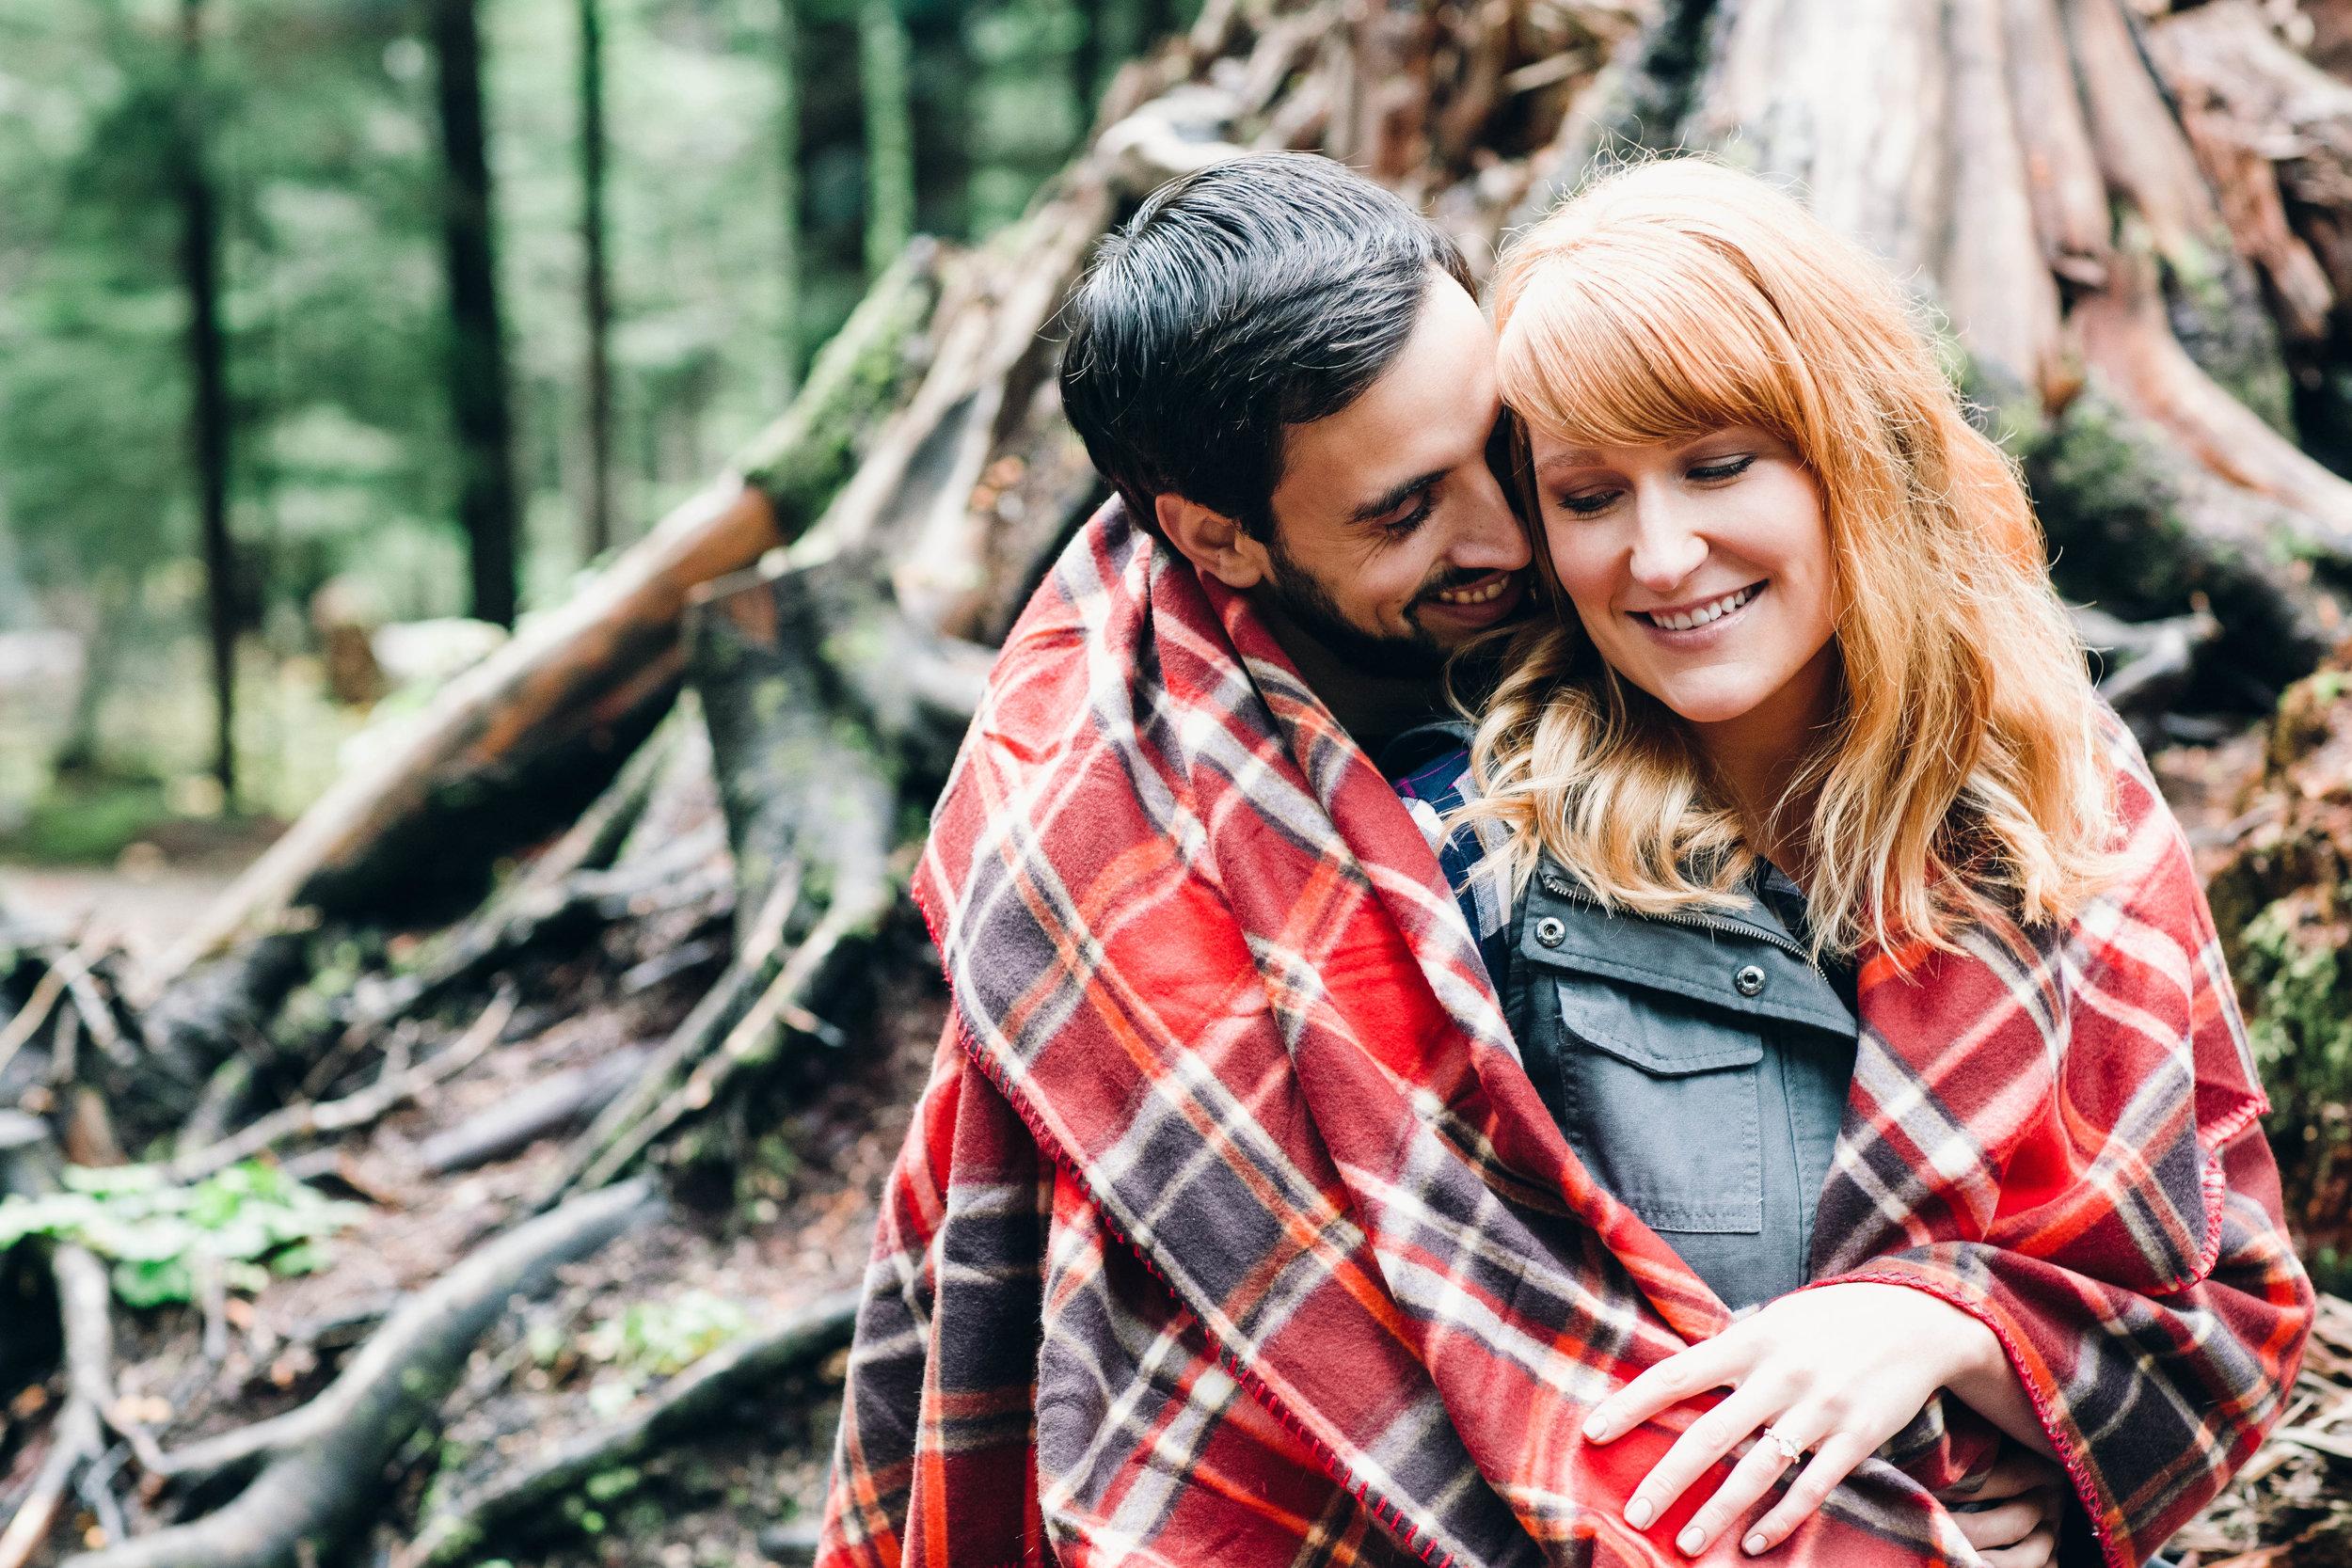 Ryan+Nicole_Franklin+Falls+Engagement_APW2016_24.JPG